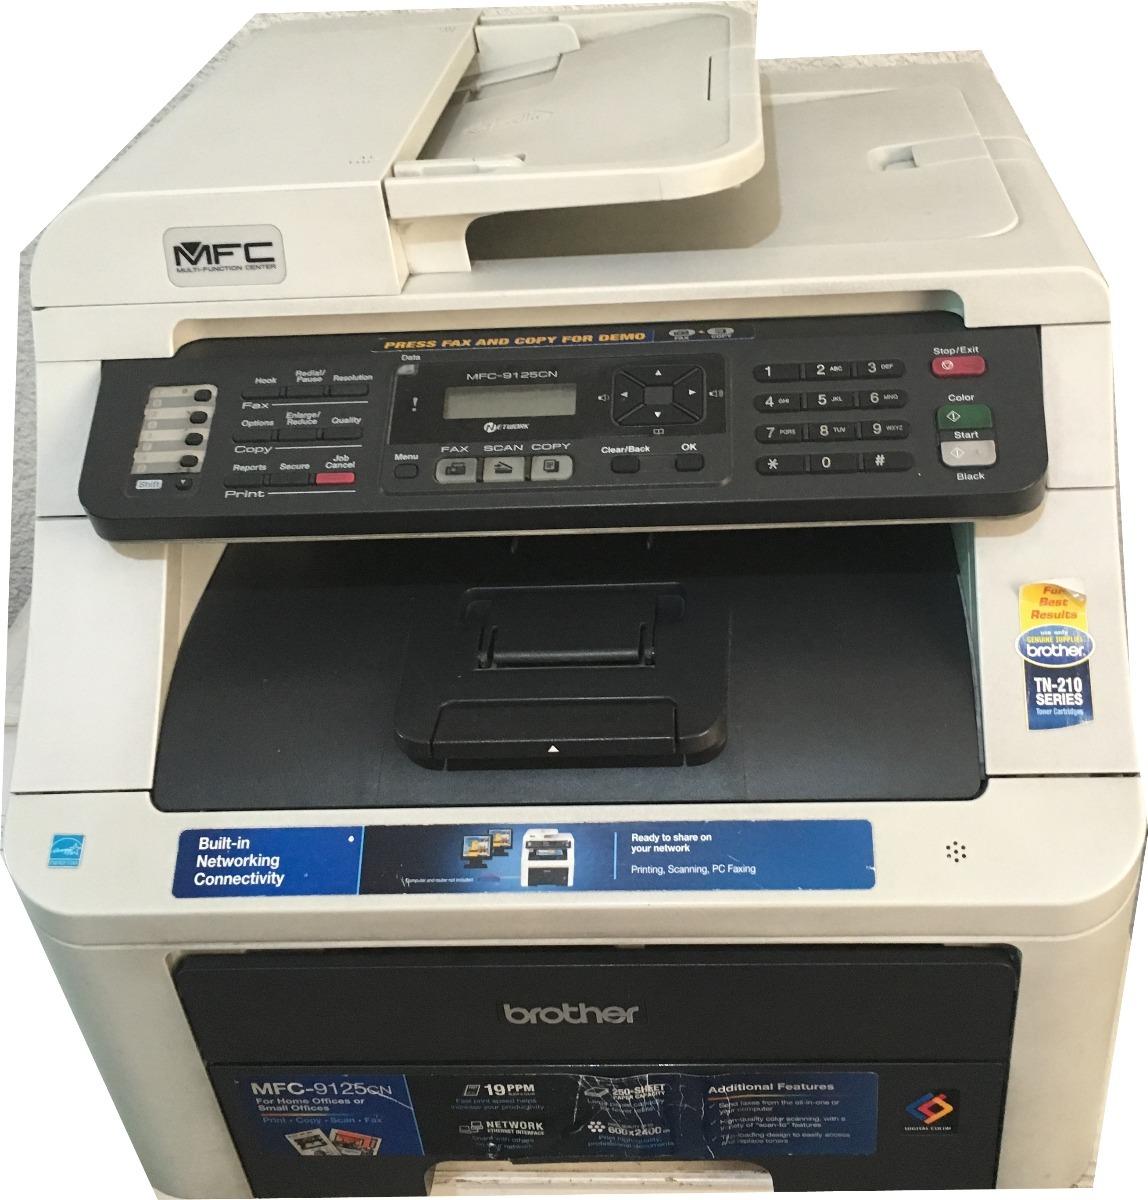 MFC-9125CN DRIVER PC